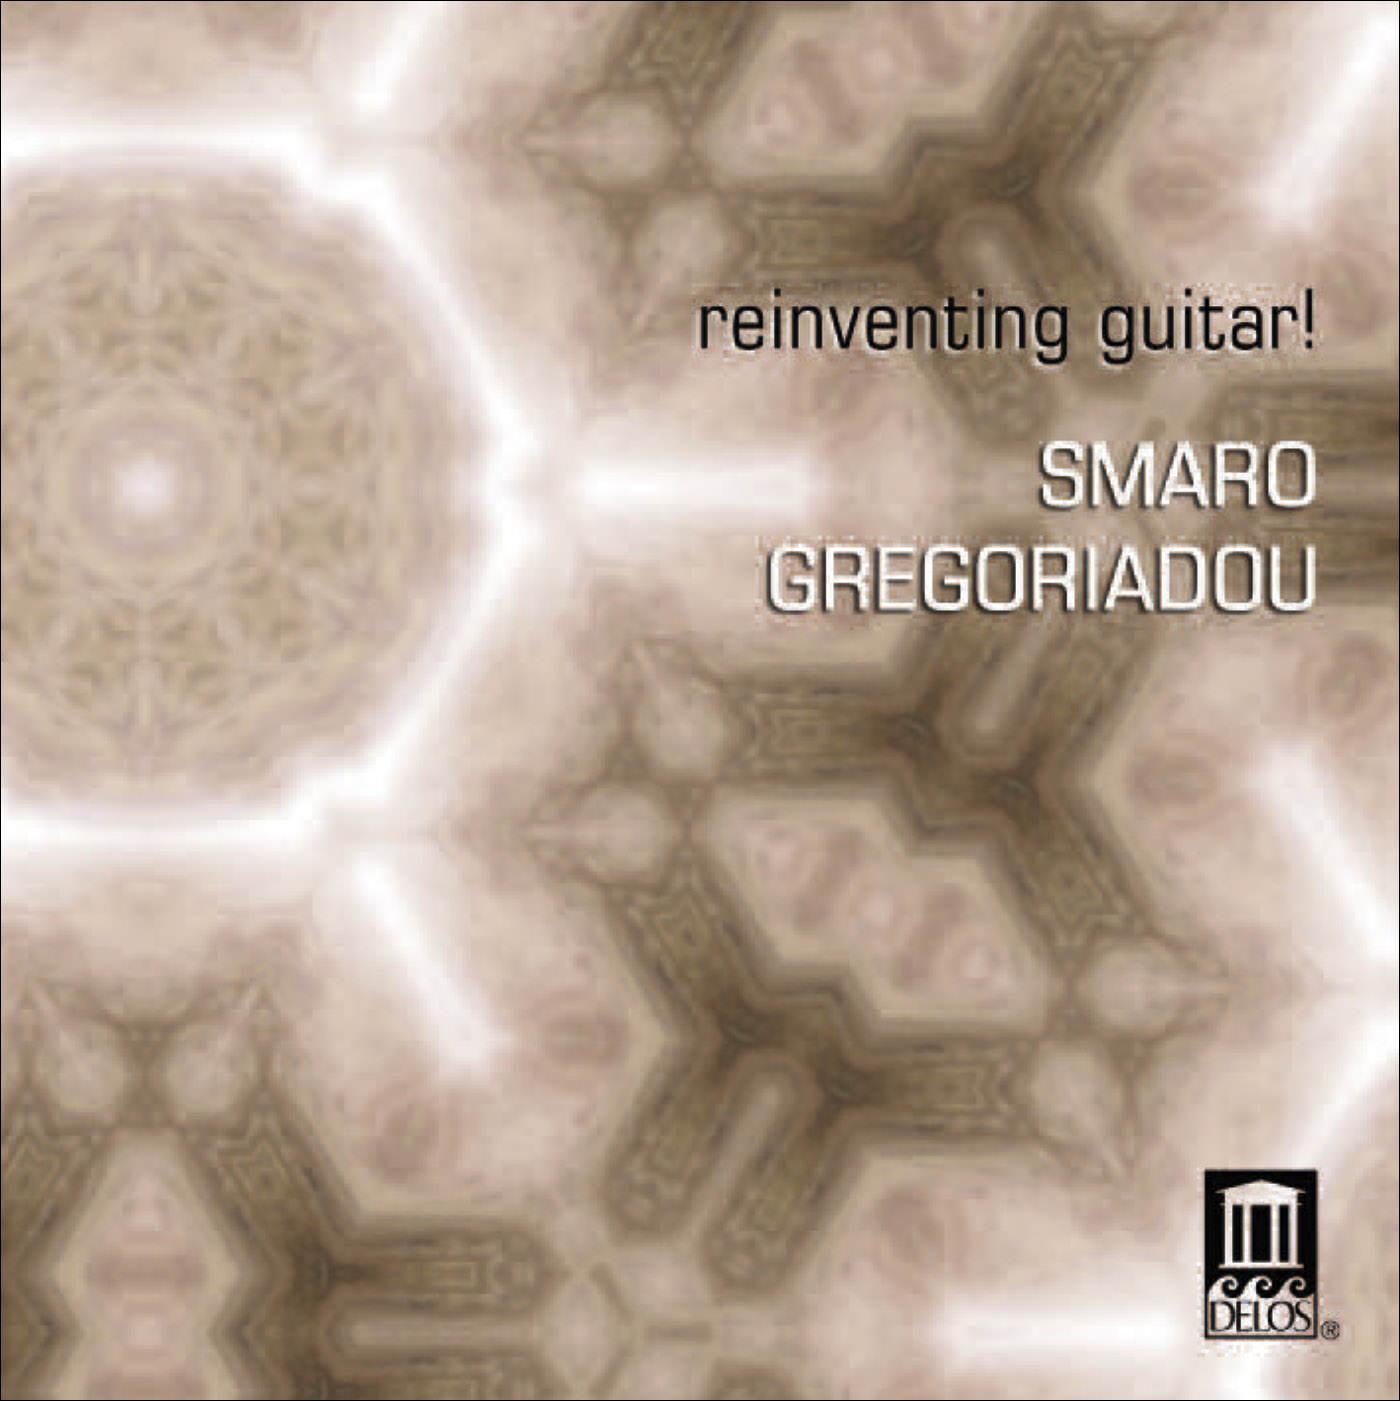 Reinventing Guitar! | Smaro Gregoriadou